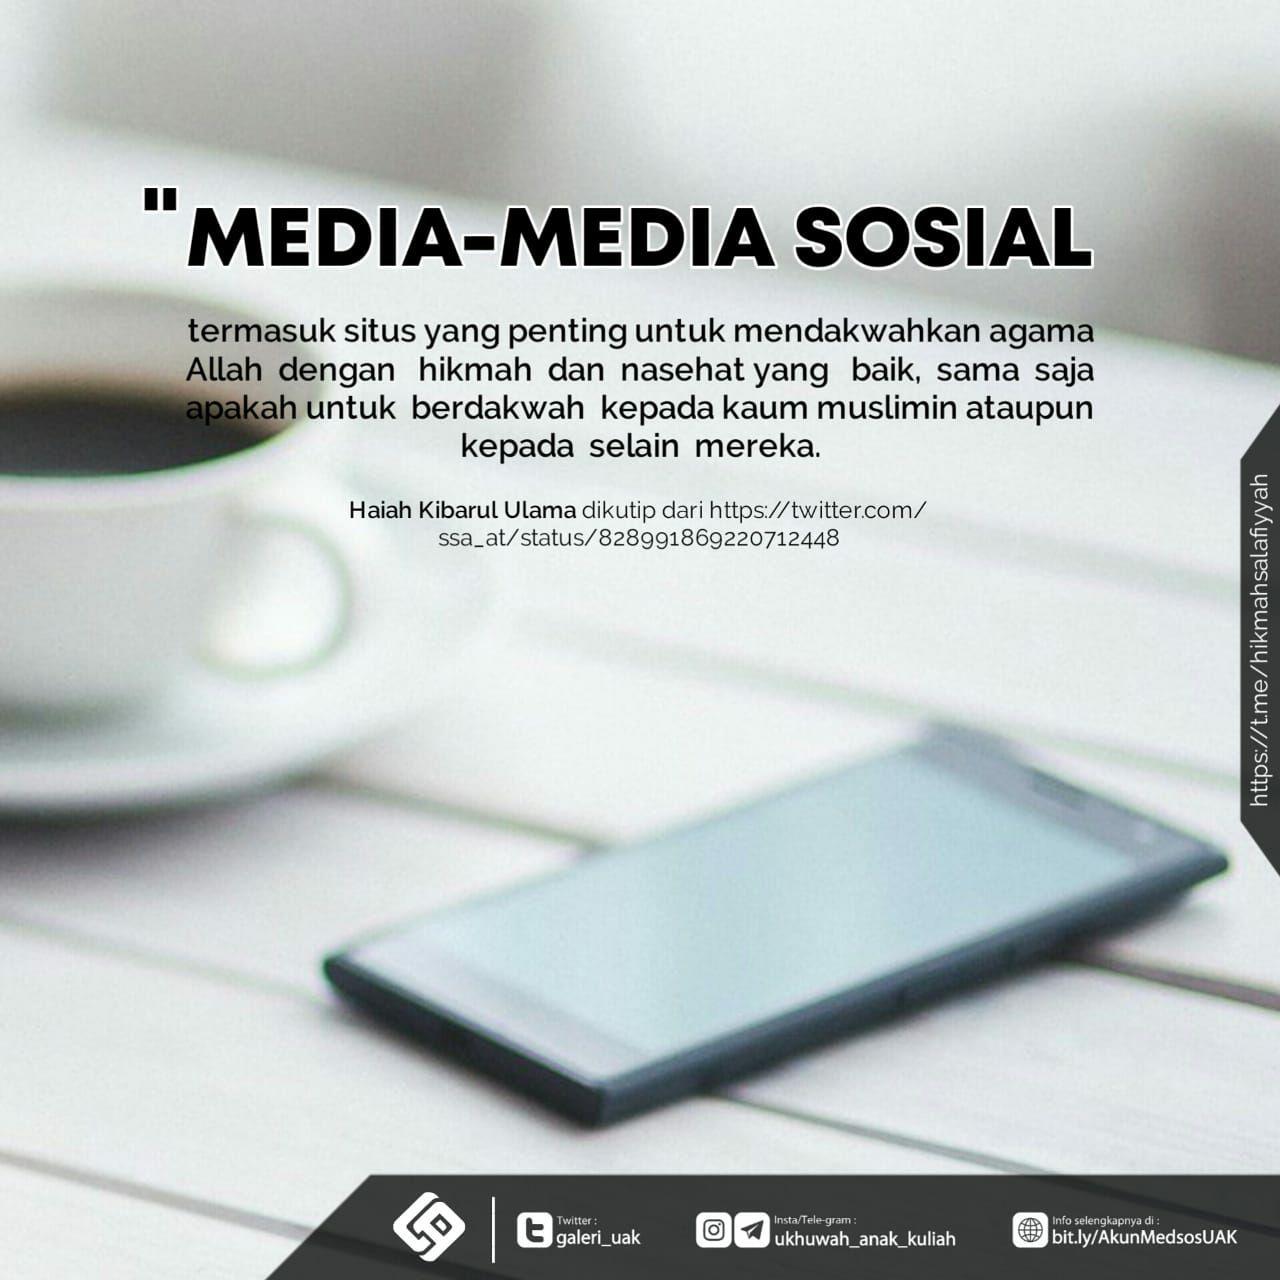 MEDIA MEDIA SOSIAL